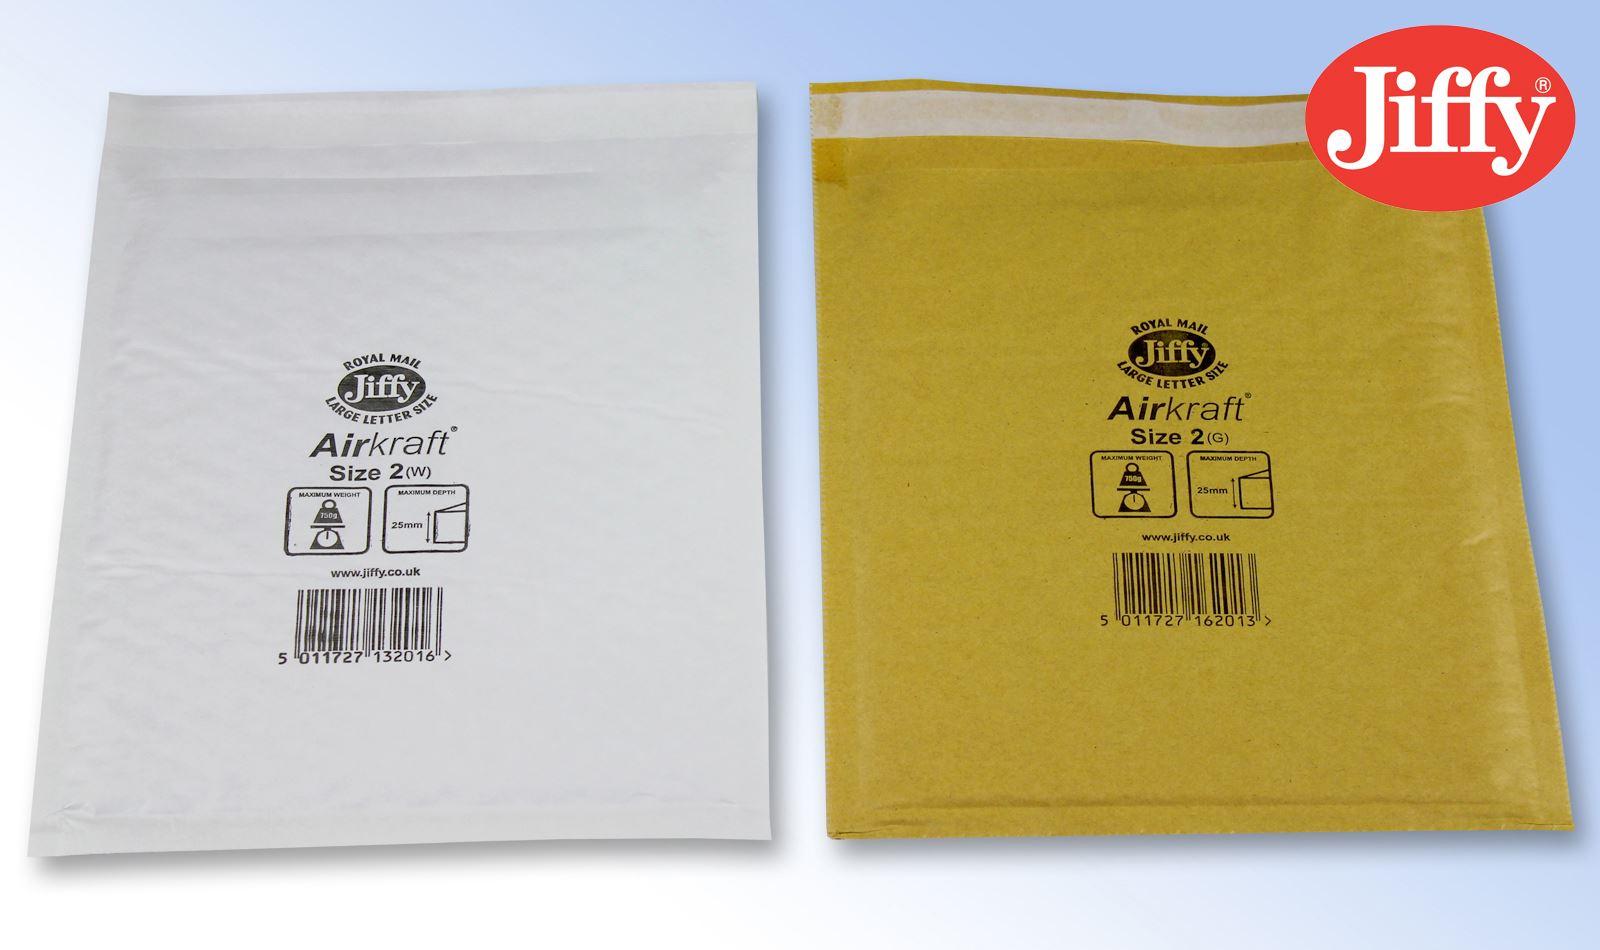 Genuine-Jiffy-Airkraft-Bags-White-Gold-Padded-Envelopes-All-Sizes